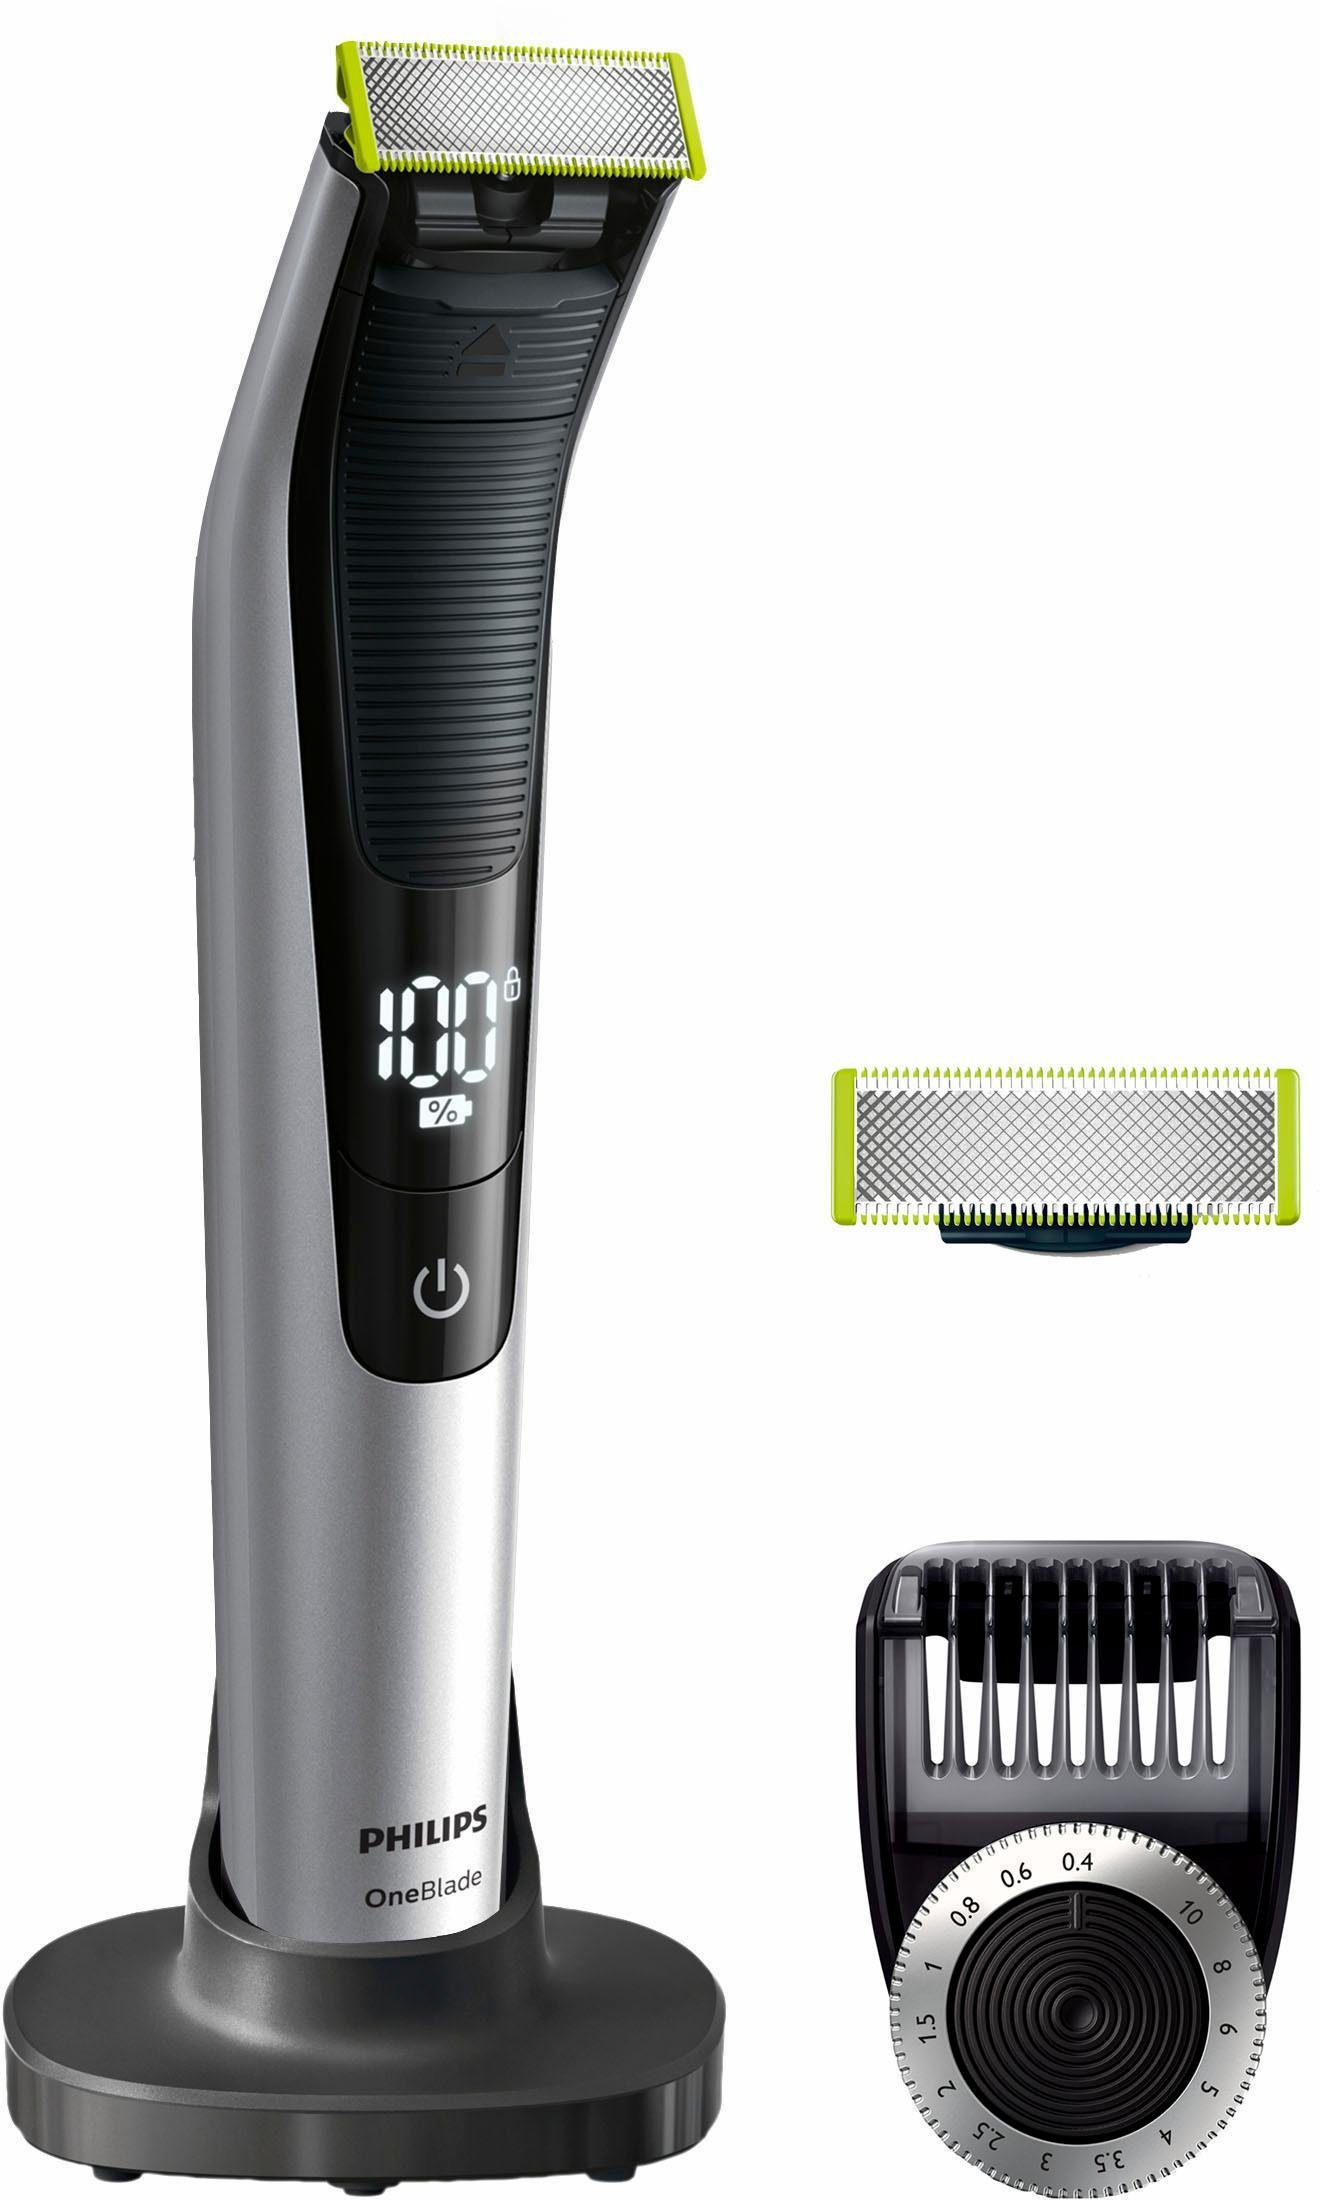 Philips Elektrorasierer OneBlade Pro QP6520/60, Aufsätze: 1, SmartClick-Präzisionstrimmer, mit Ersatzklinge, Akku, Wet&Dry, LED-Display